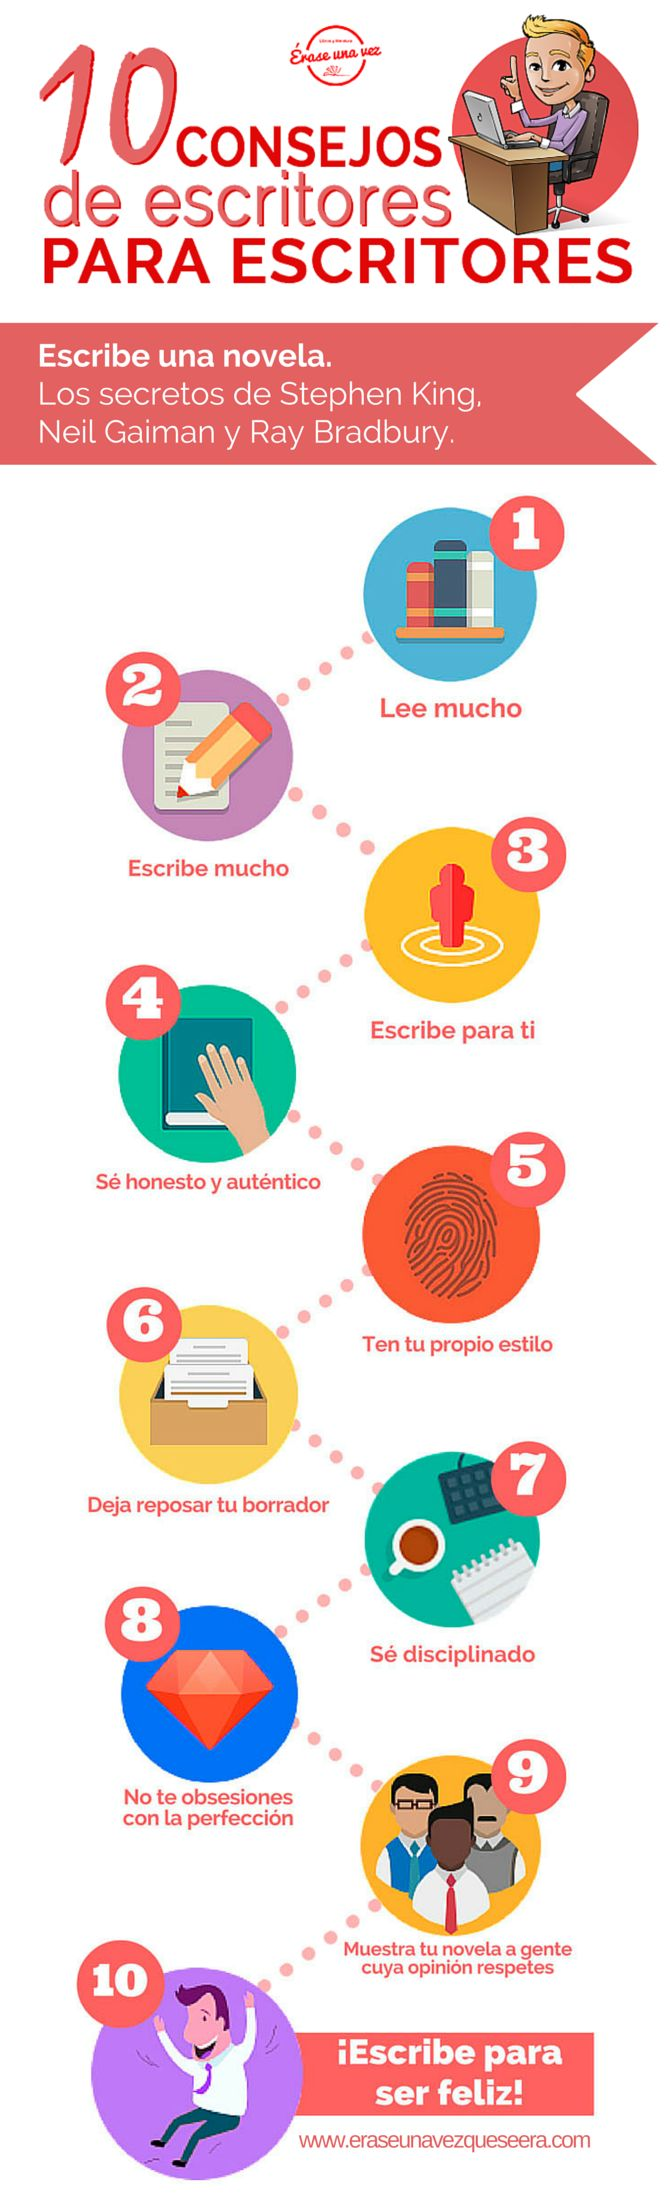 10 consejos de escritores para escritores. http://www.eraseunavezqueseera.com/2015/03/11/diez-consejos-de-escritores-para-escritores-infografia/